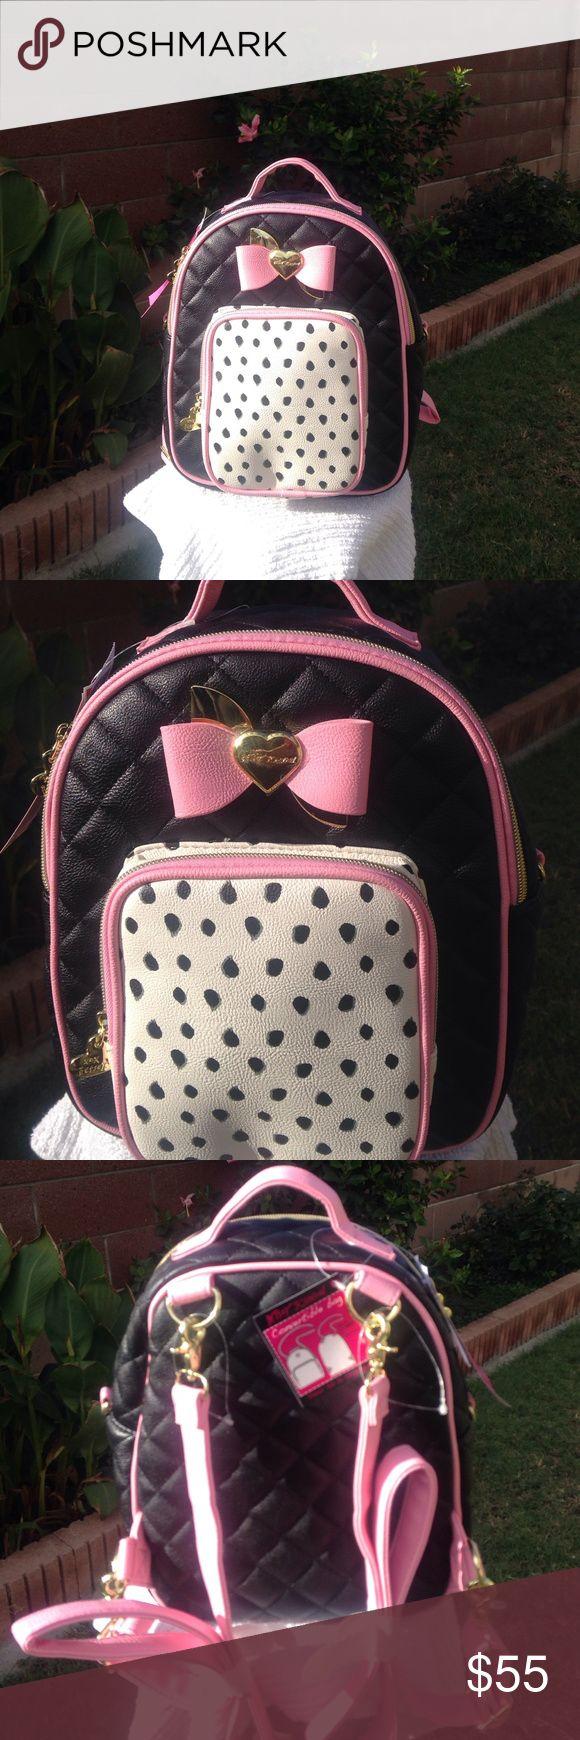 NWT BETSEY JOHNSON BACKPACK NWT BETSEY JOHNSON QUILTED BACKPACK Betsey Johnson Bags Backpacks